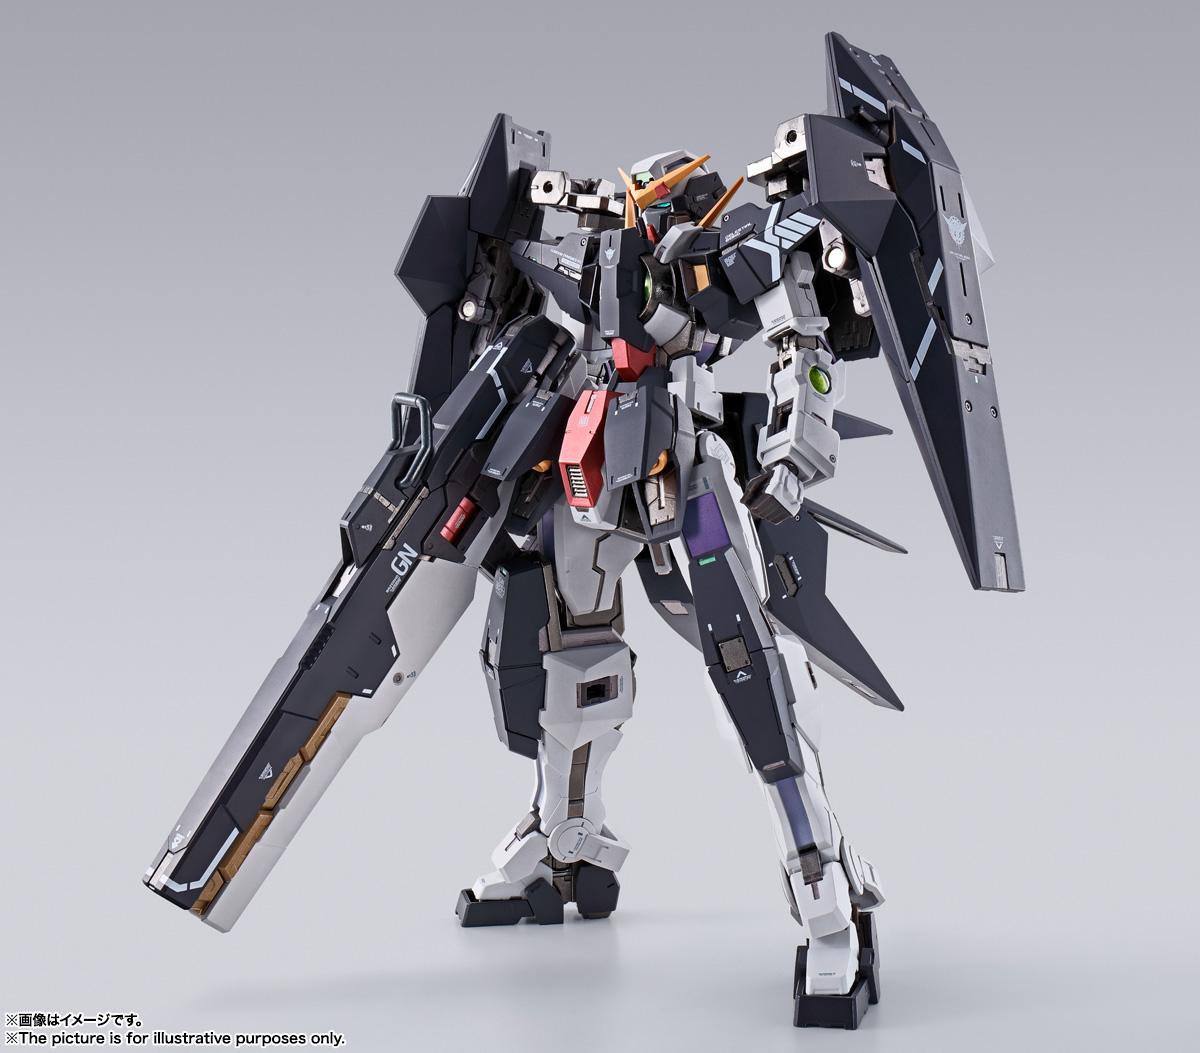 METAL BUILD『ガンダムデュナメス リペアIII』ガンダム00 可動フィギュア-008